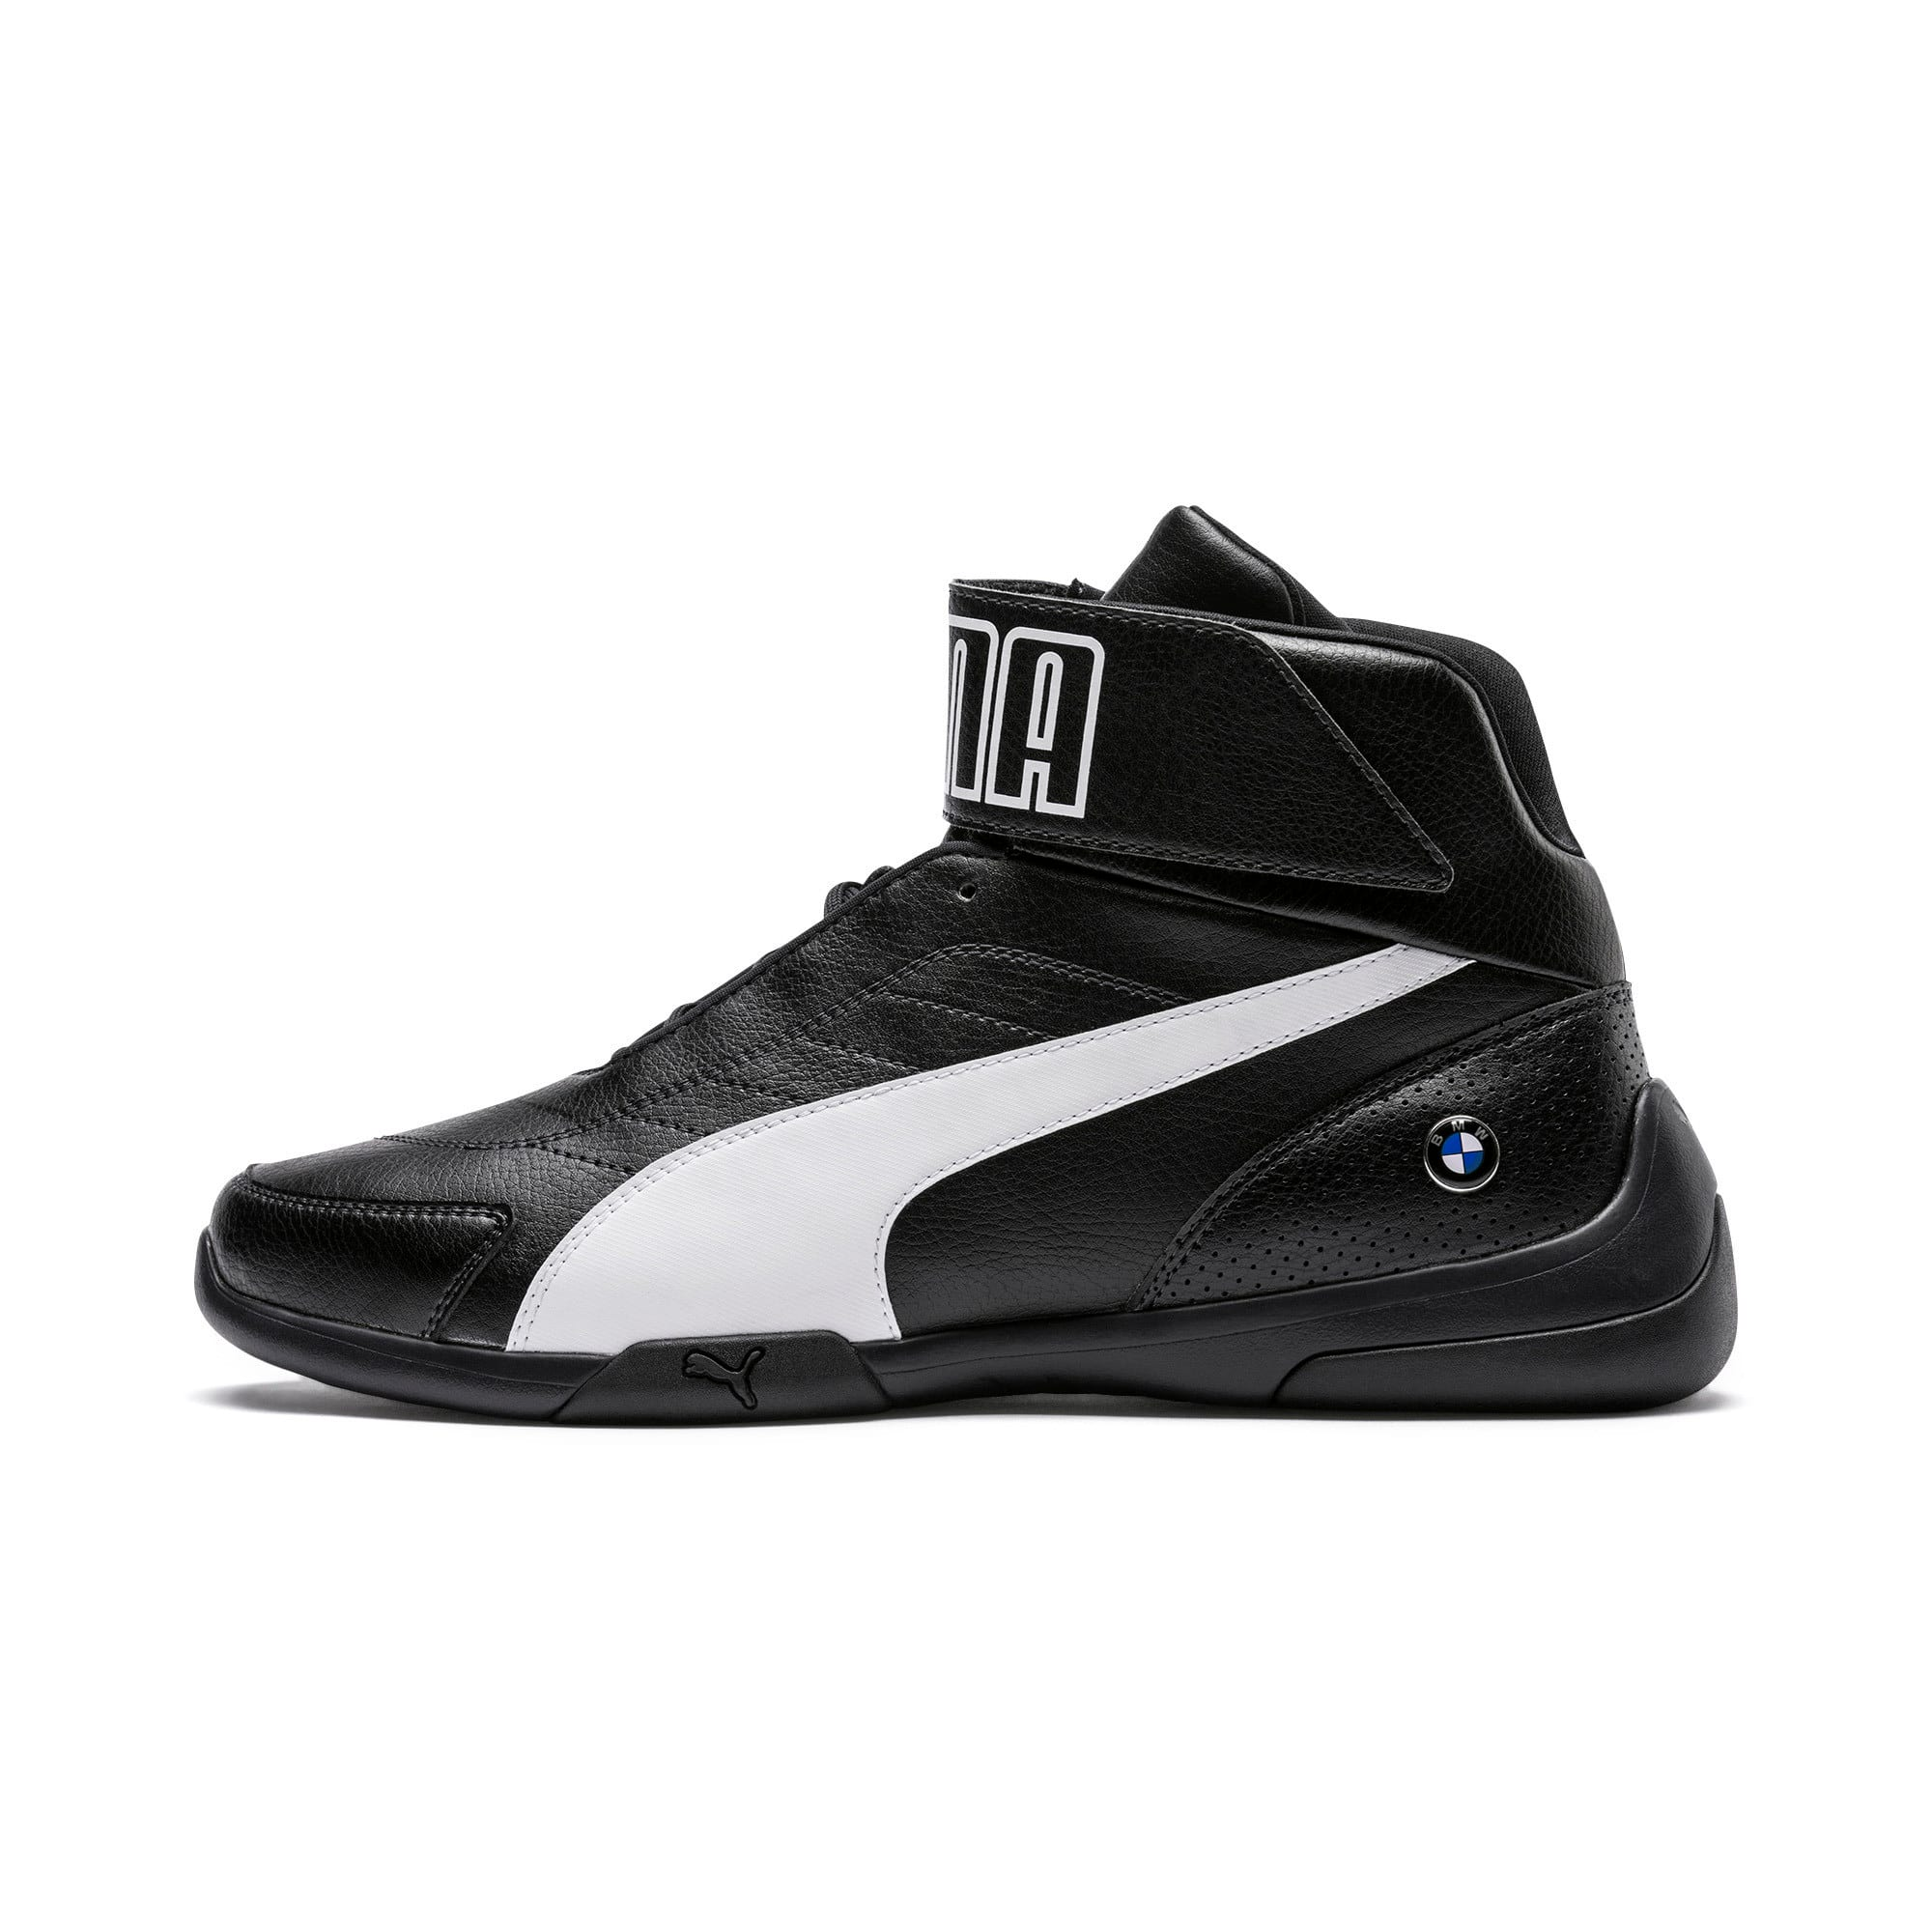 Thumbnail 1 of BMW M Motorsport Kart Cat III Mid Men's Shoes, Anthracite-Puma White, medium